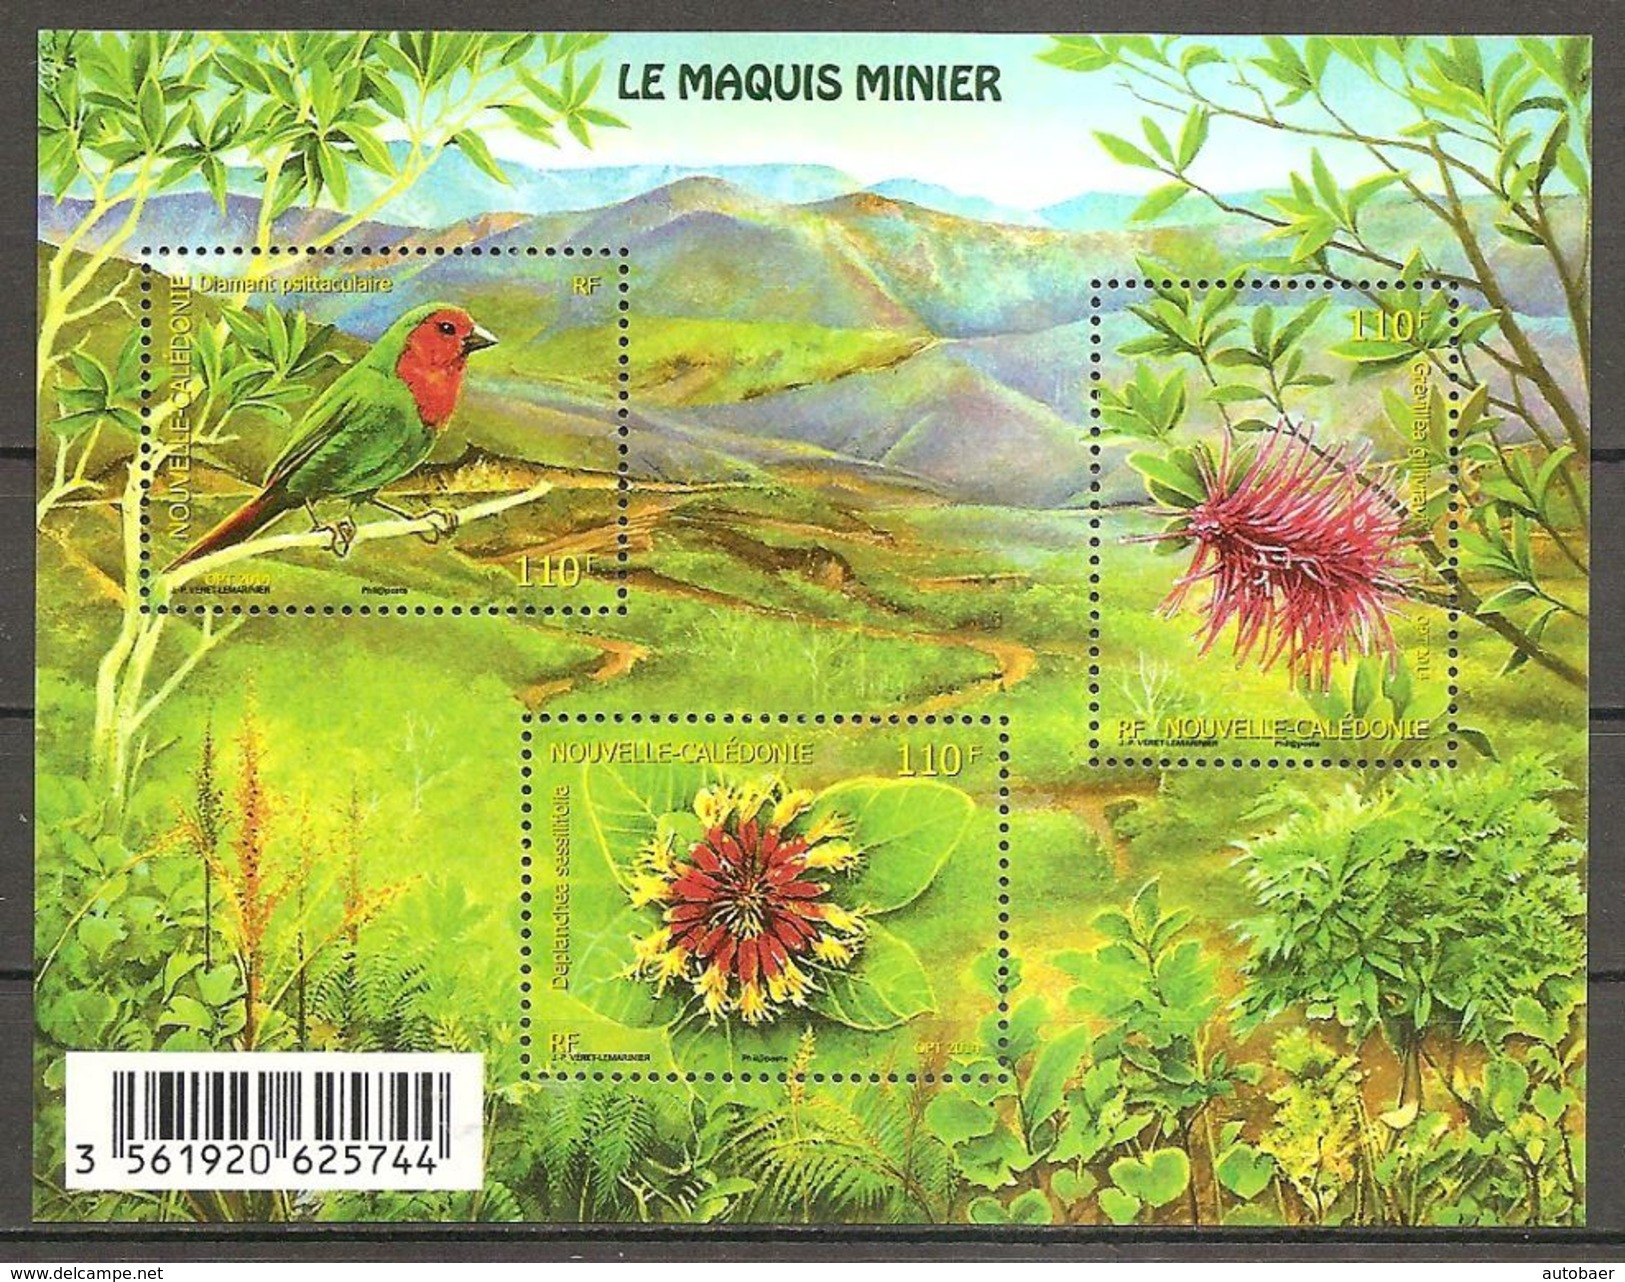 Neukaledonien Nouvelle Caledonie 2014 Le Maquies Minier Unterholz Der Minengebiete Michel No. Bl. 51 (1654-56) MNH Neuf - Neukaledonien